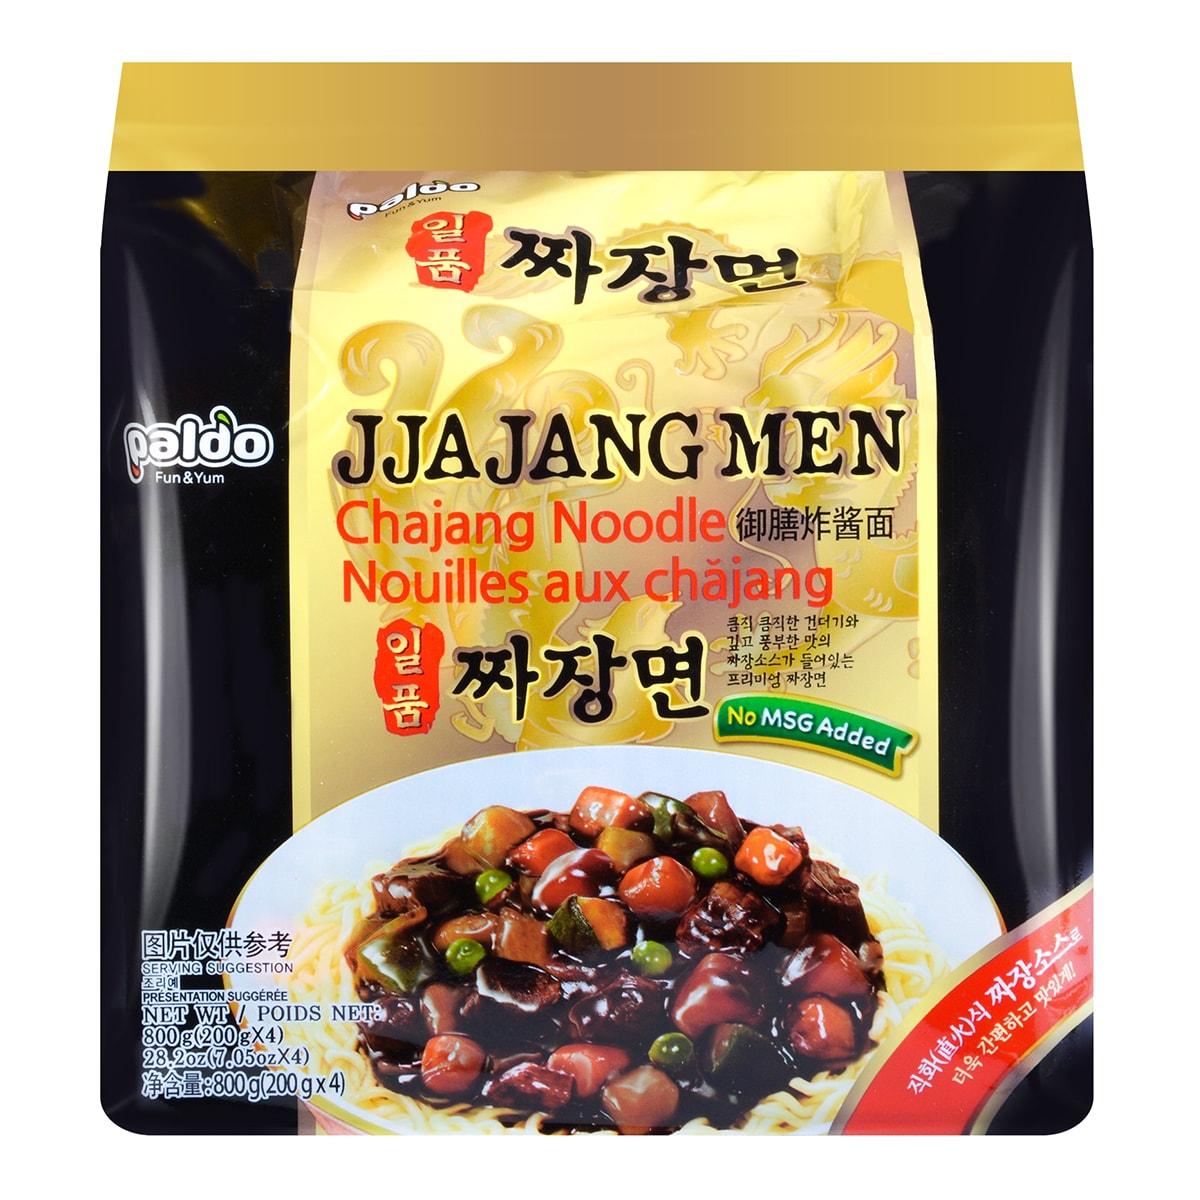 PALDO Instant Ramen With Soybean Paste 4 Packs